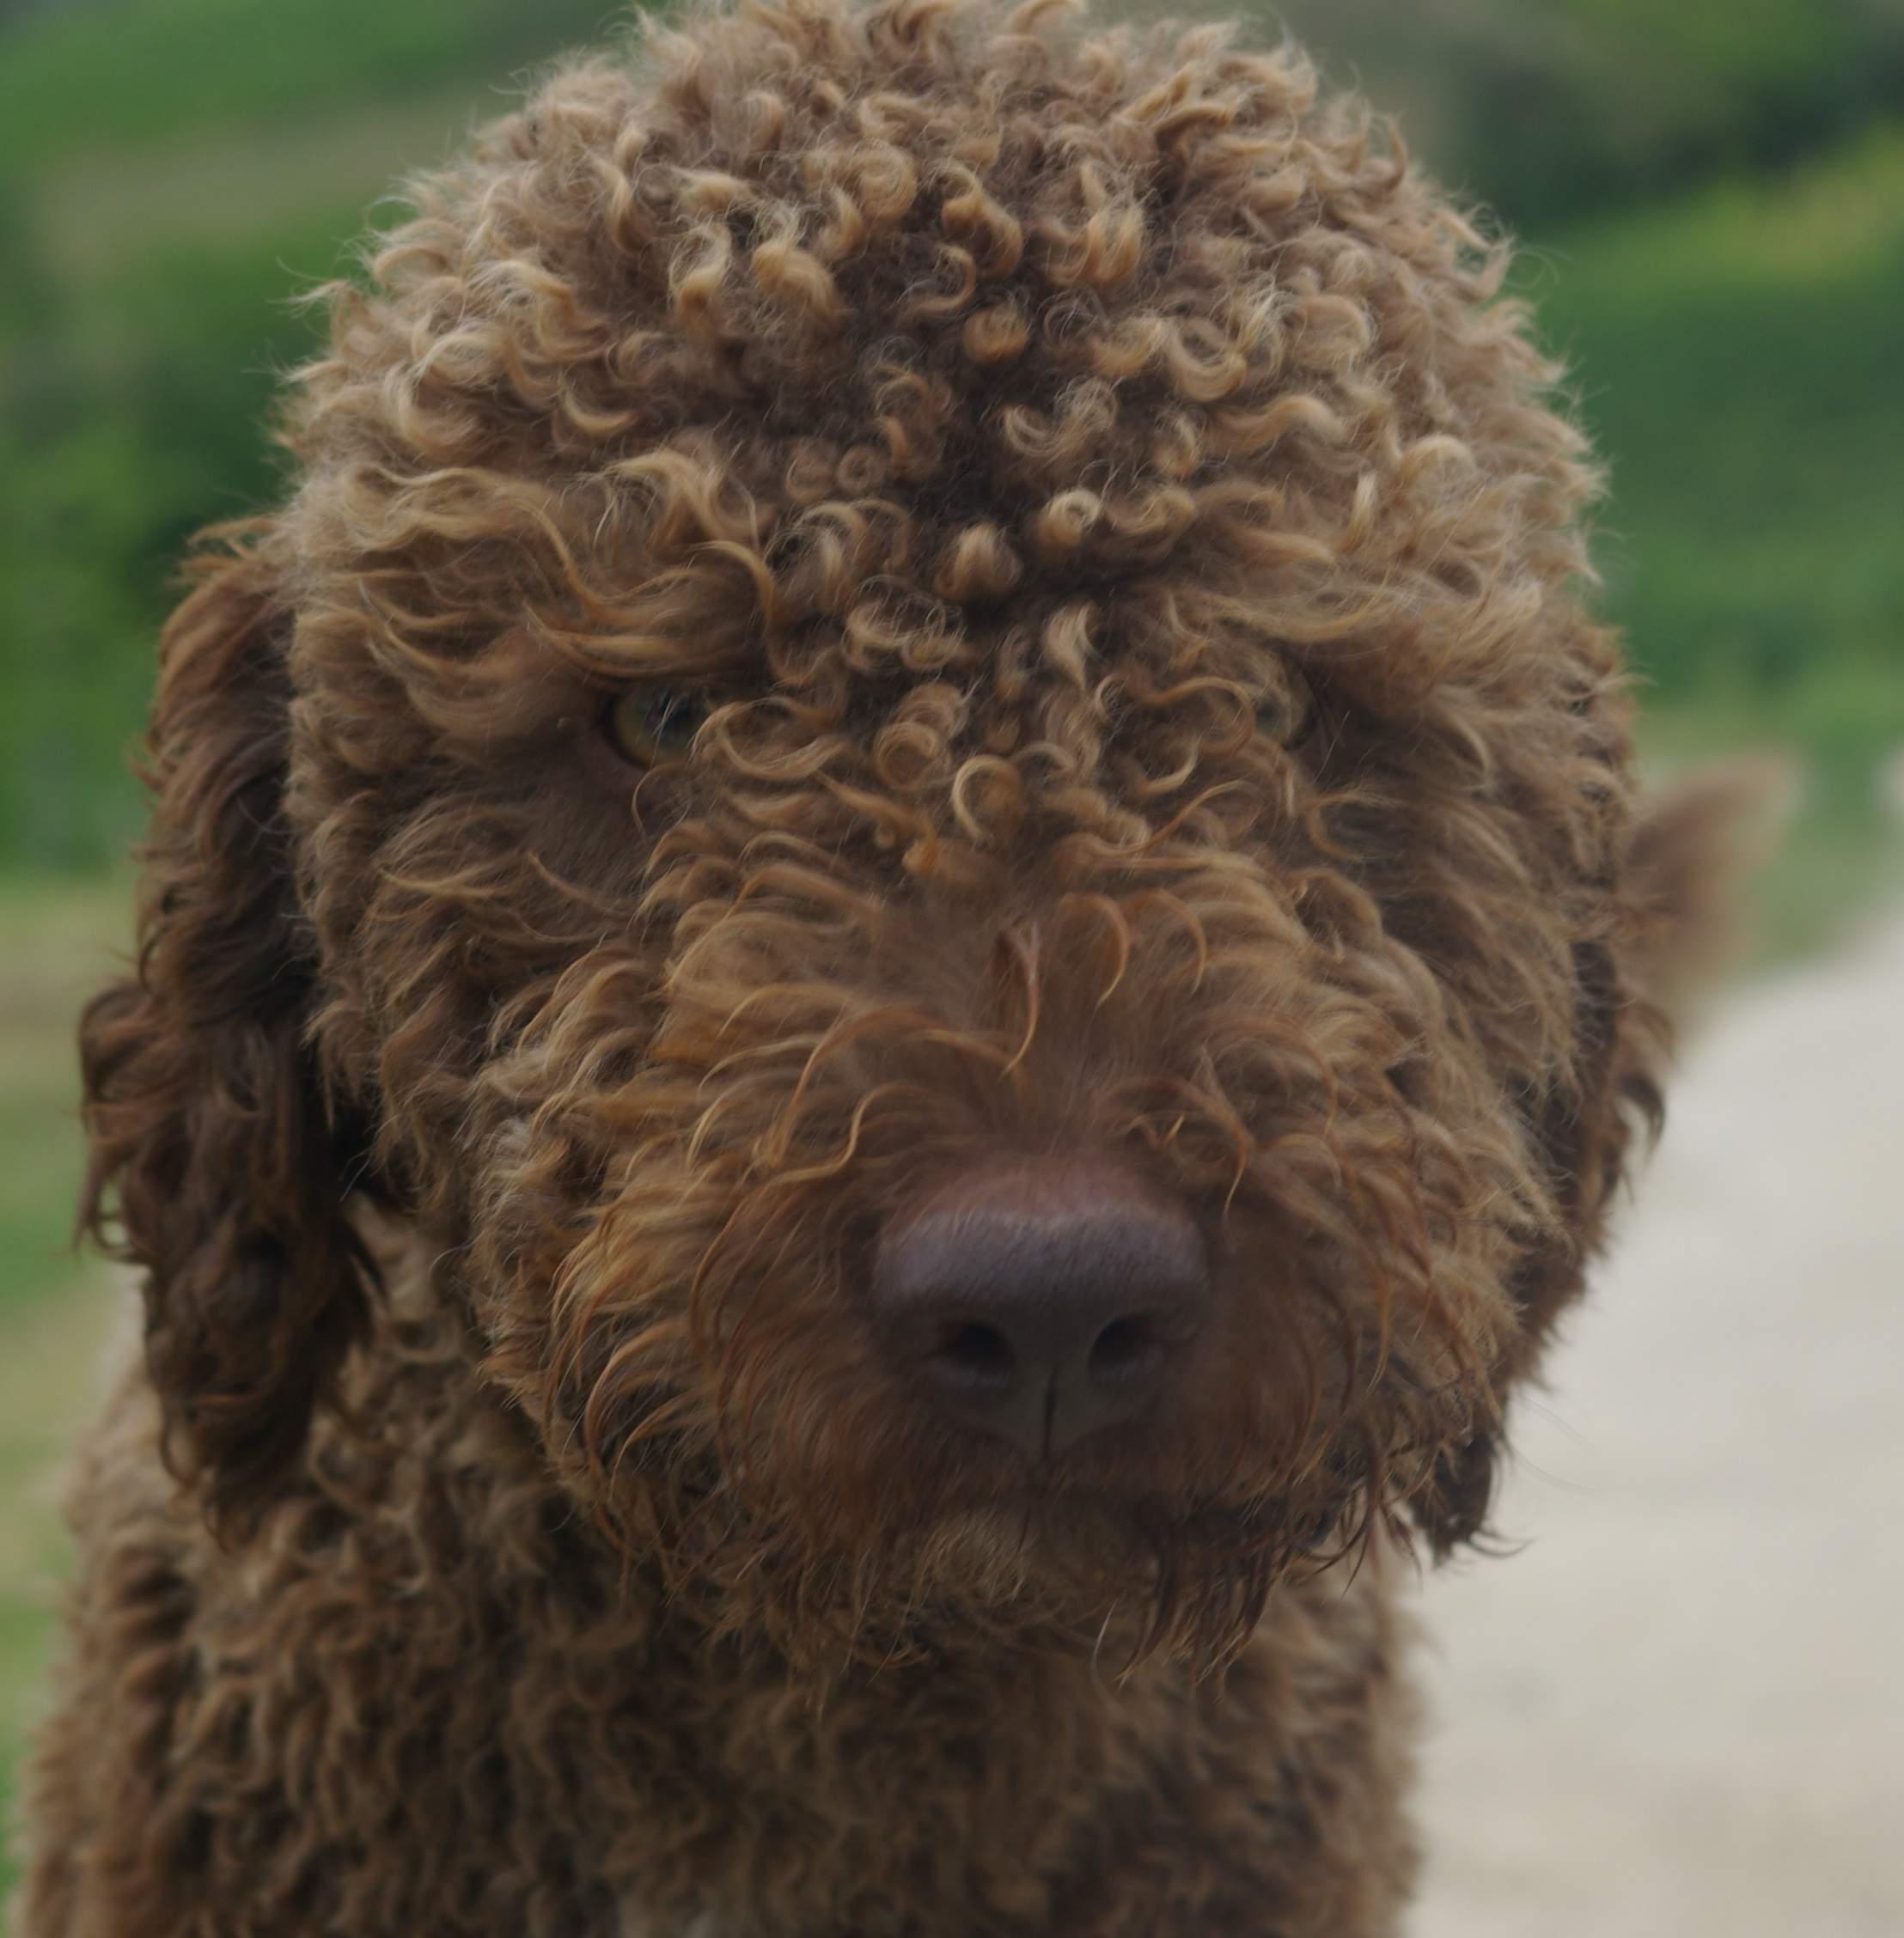 Lagotto Romagnolo Dog: Lagotto Lagotto Romagnolo Dog Face Breed